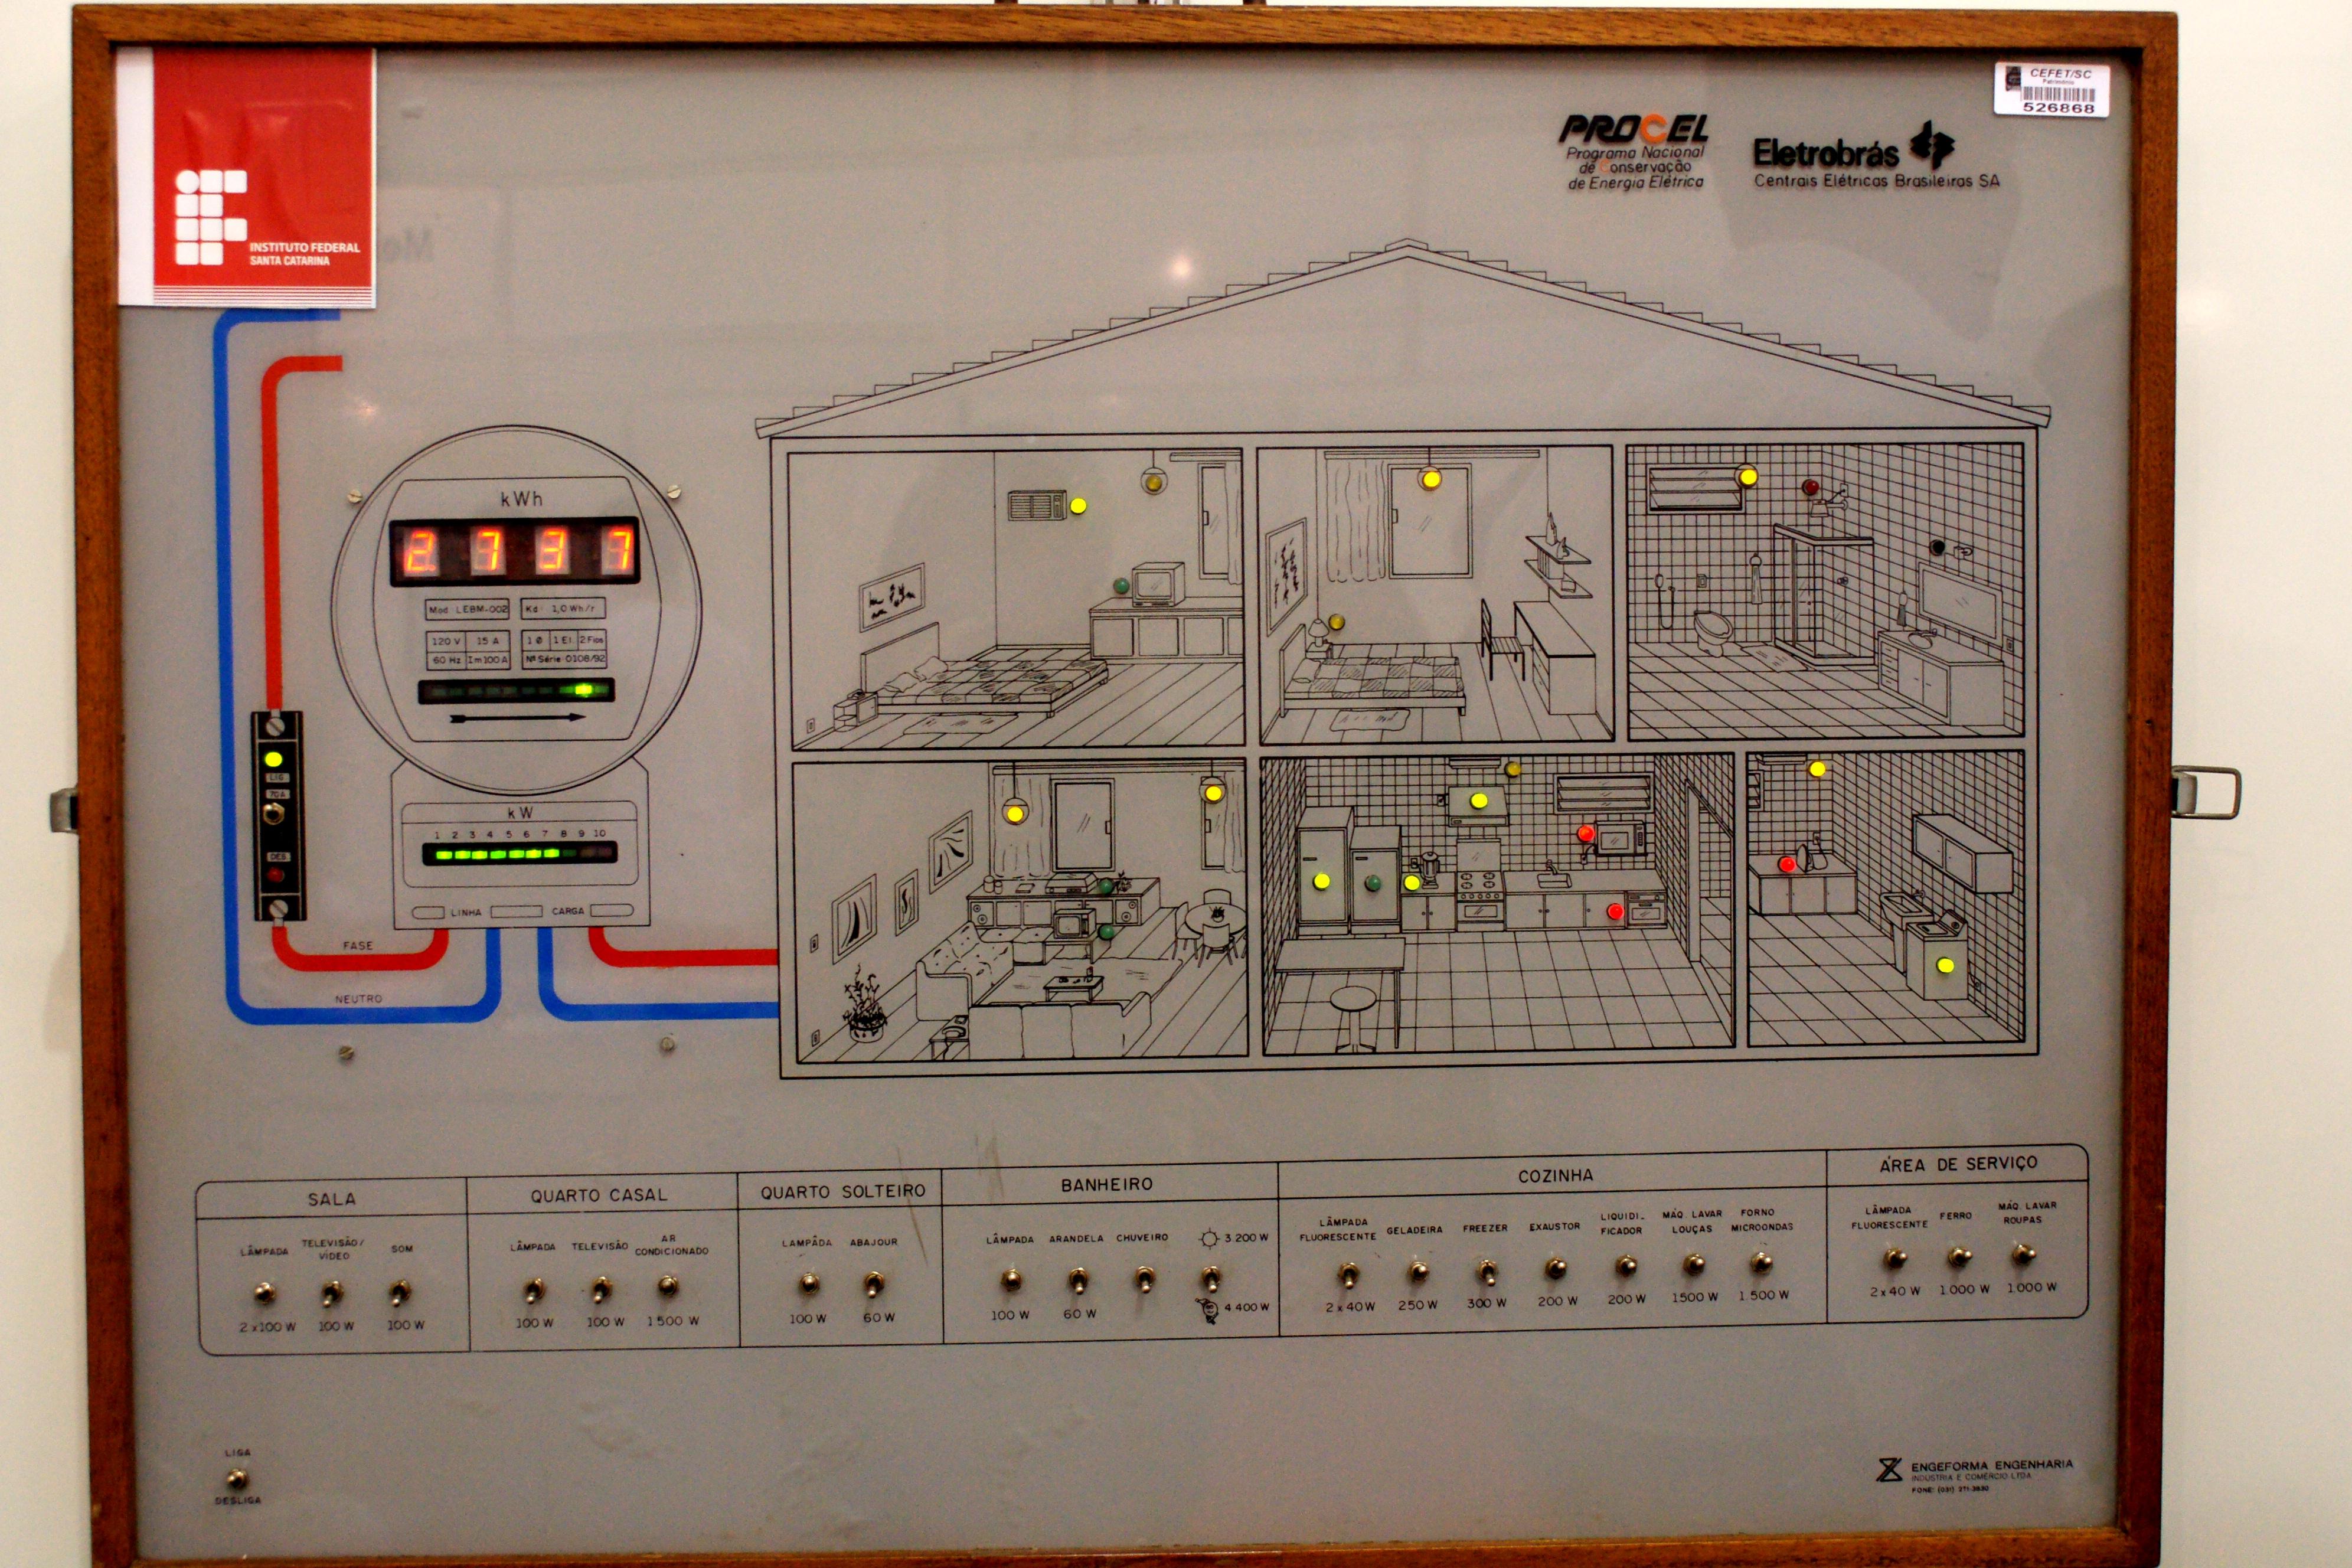 Circuito Eletricos : Sistemas de energia tem painel de circuito elétrico para cadeirantes